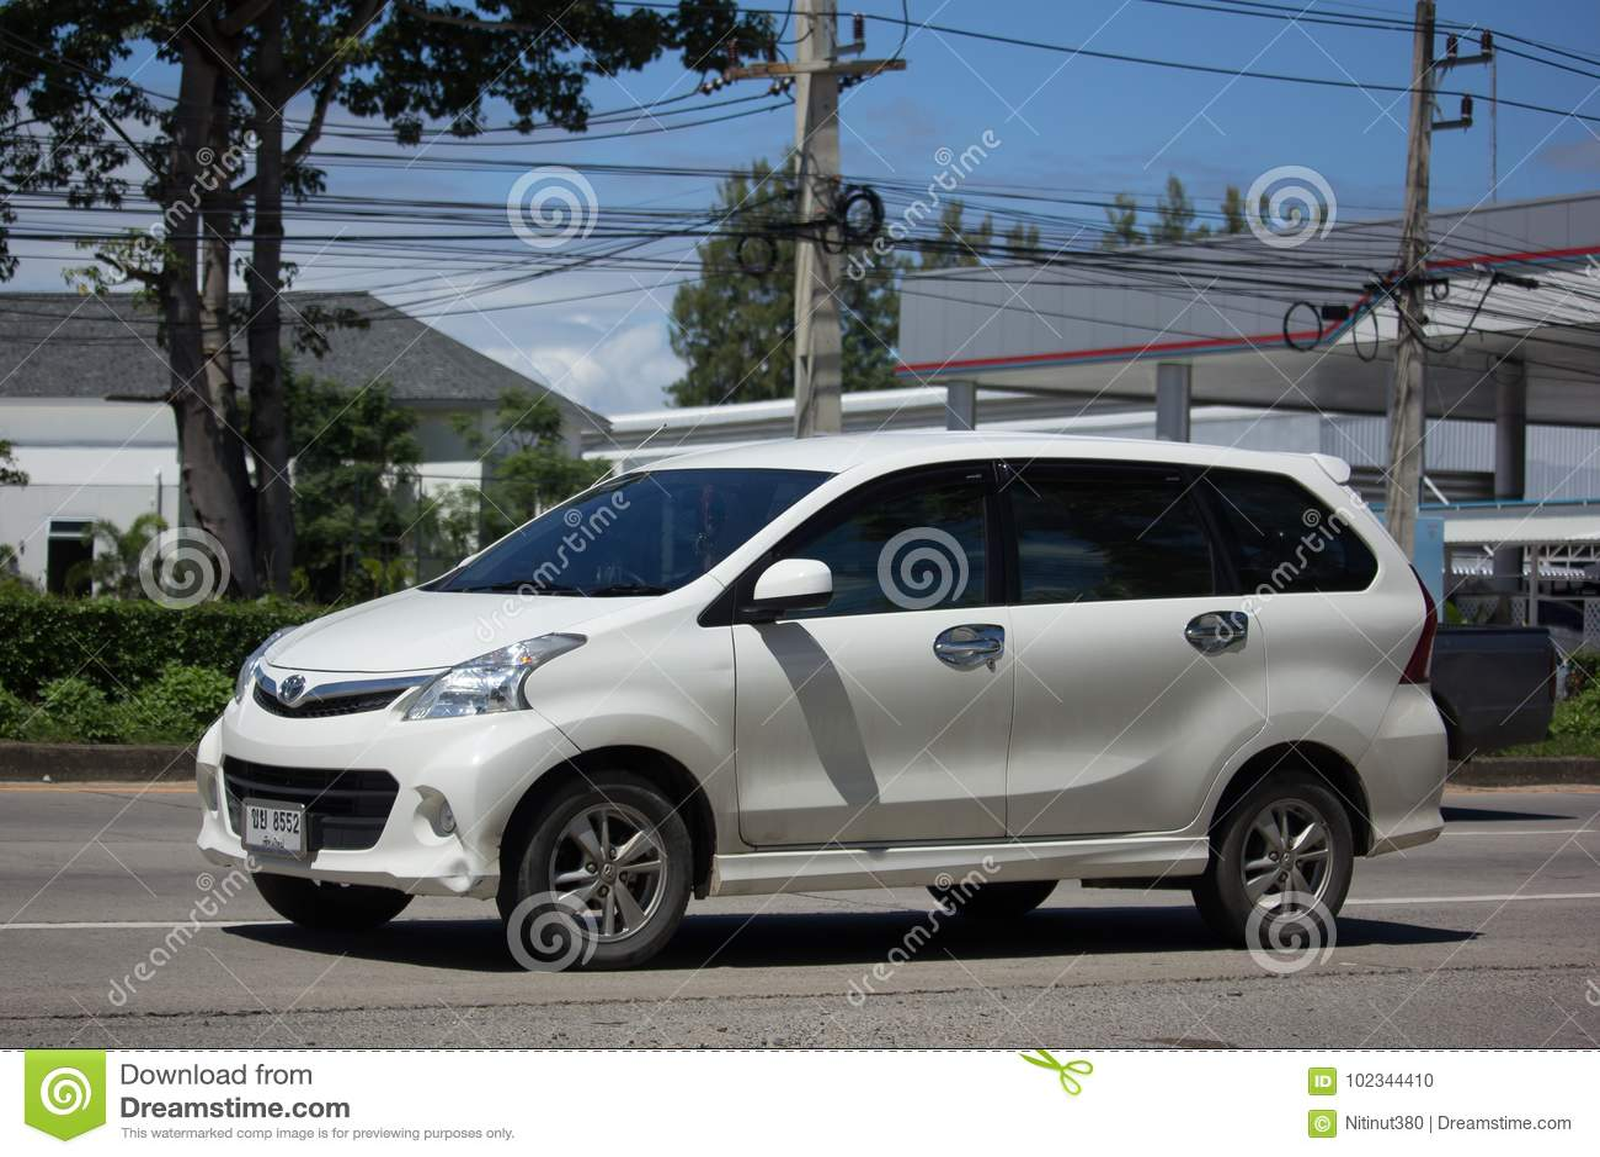 8100 Unduh Gambar Mobil Avanza Gratis